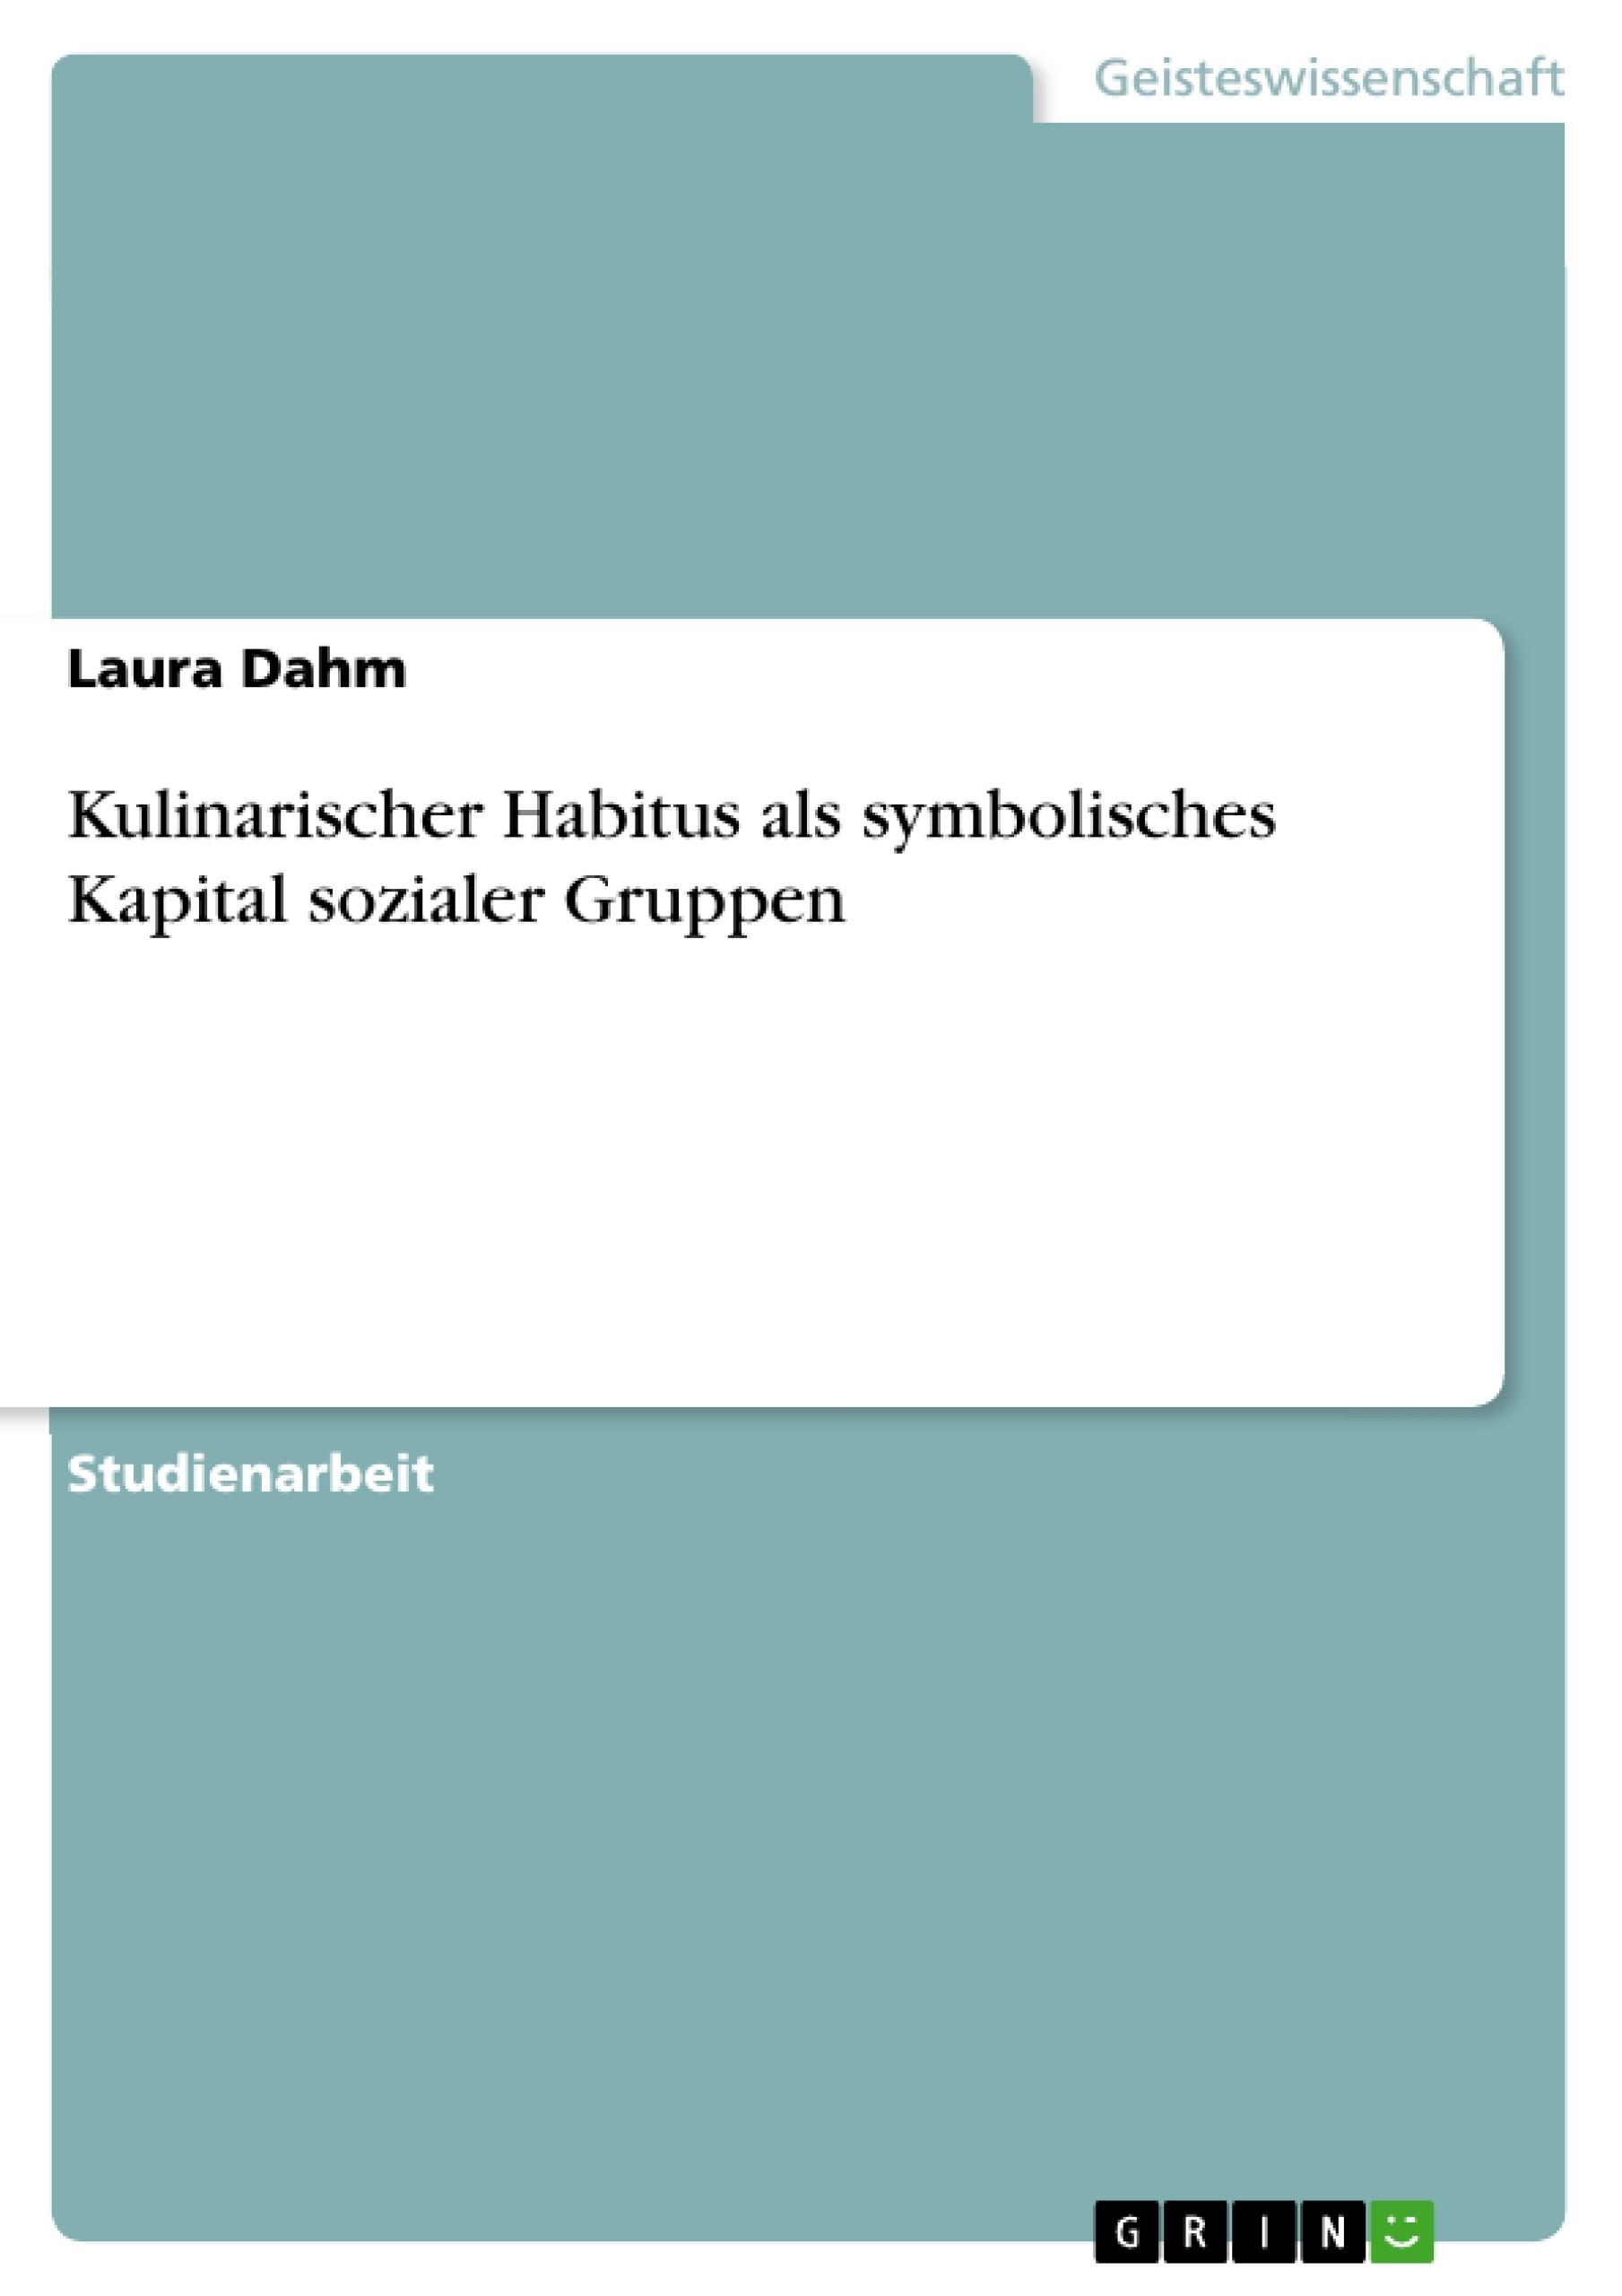 Titel: Kulinarischer Habitus als symbolisches Kapital sozialer Gruppen